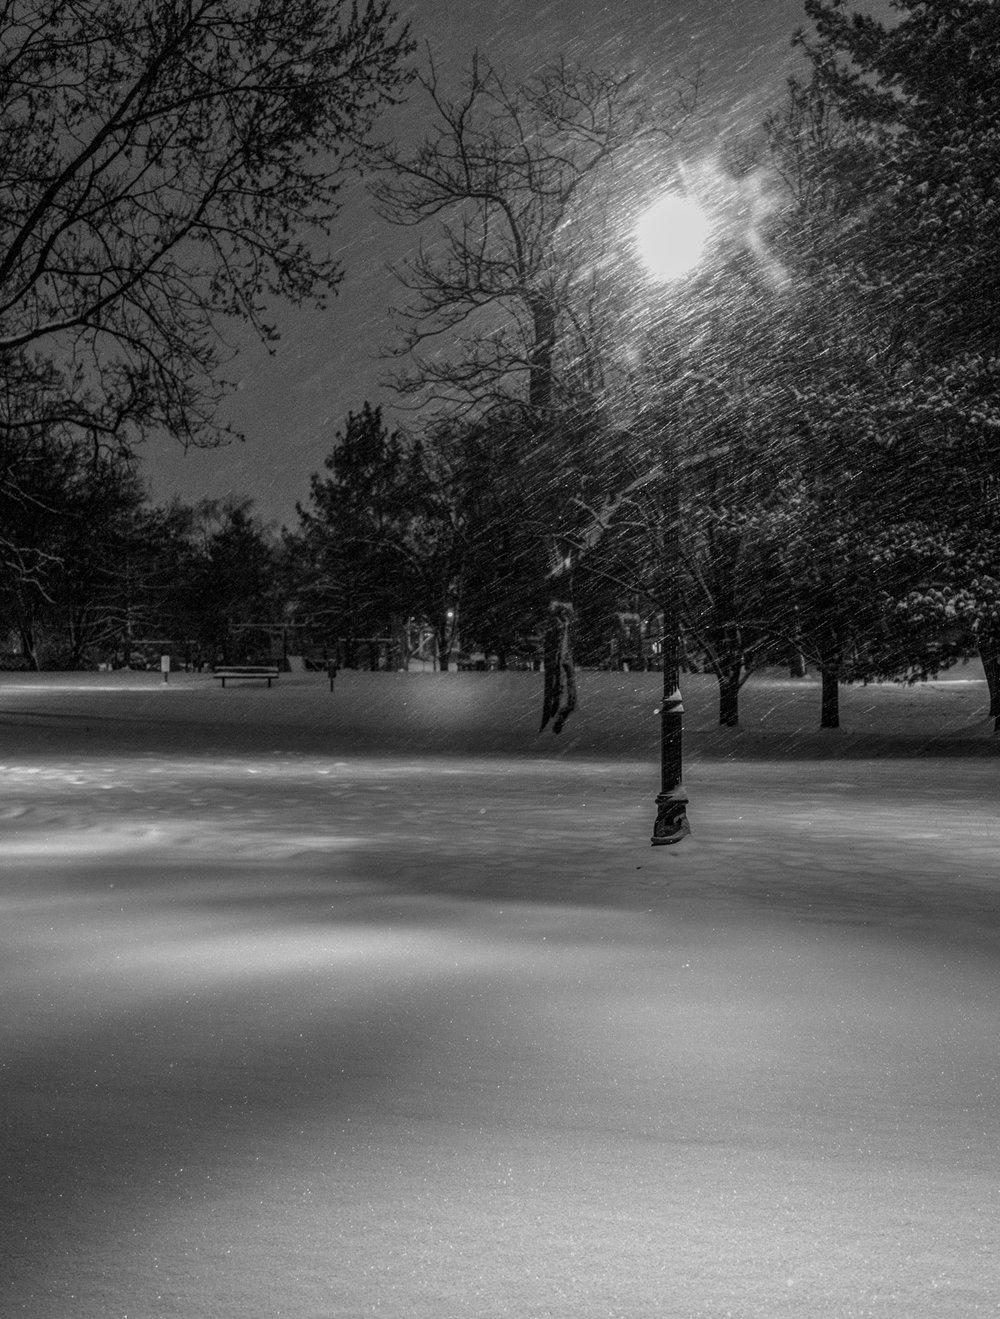 In Goodale Park Lamp Post 3